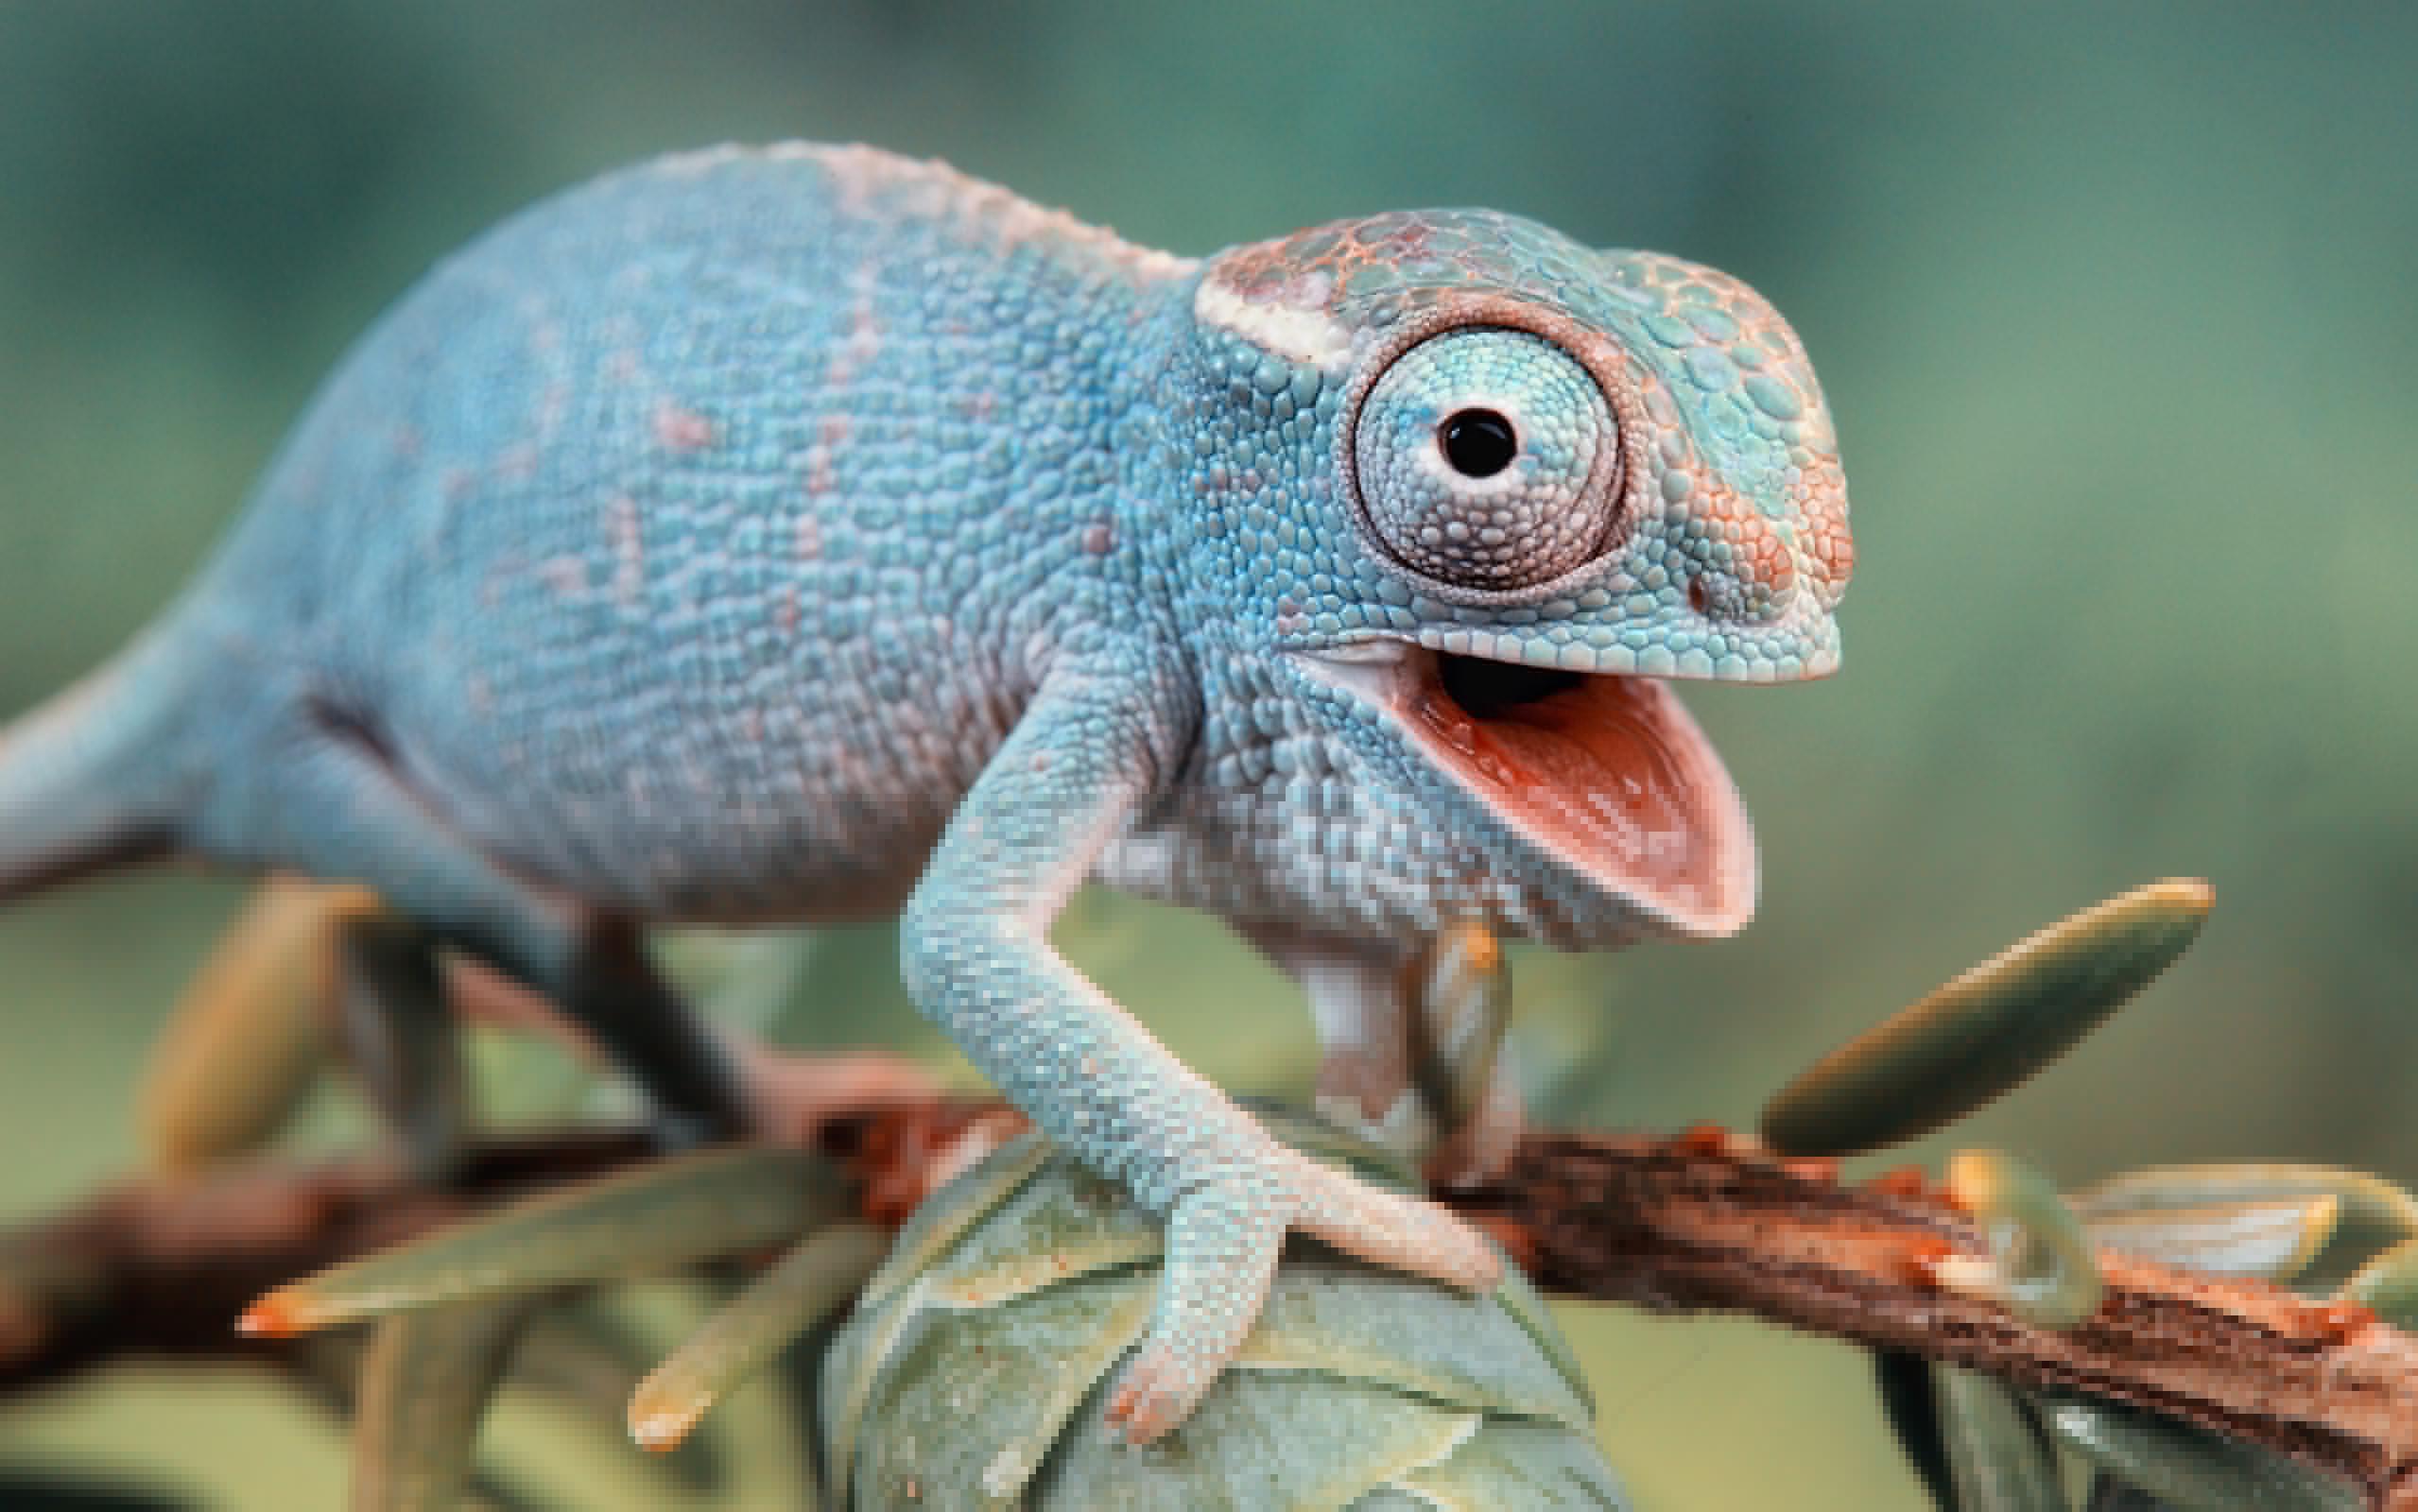 картинки хамелеона животное меладзе никогда